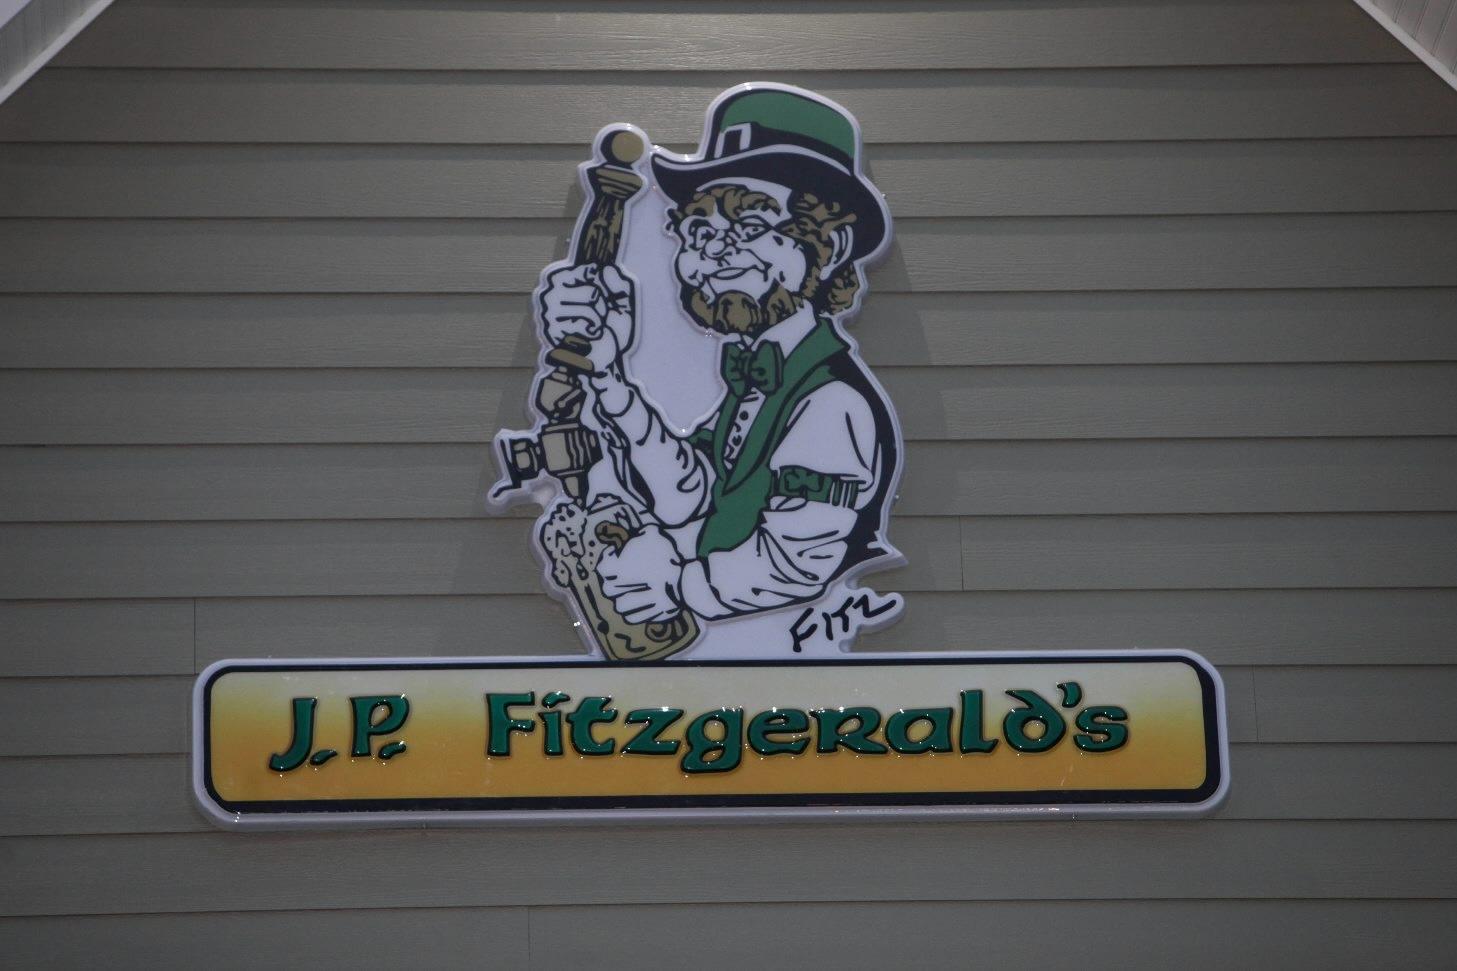 J.P. Fitzgerald's on Clark Street in Hamubrg.